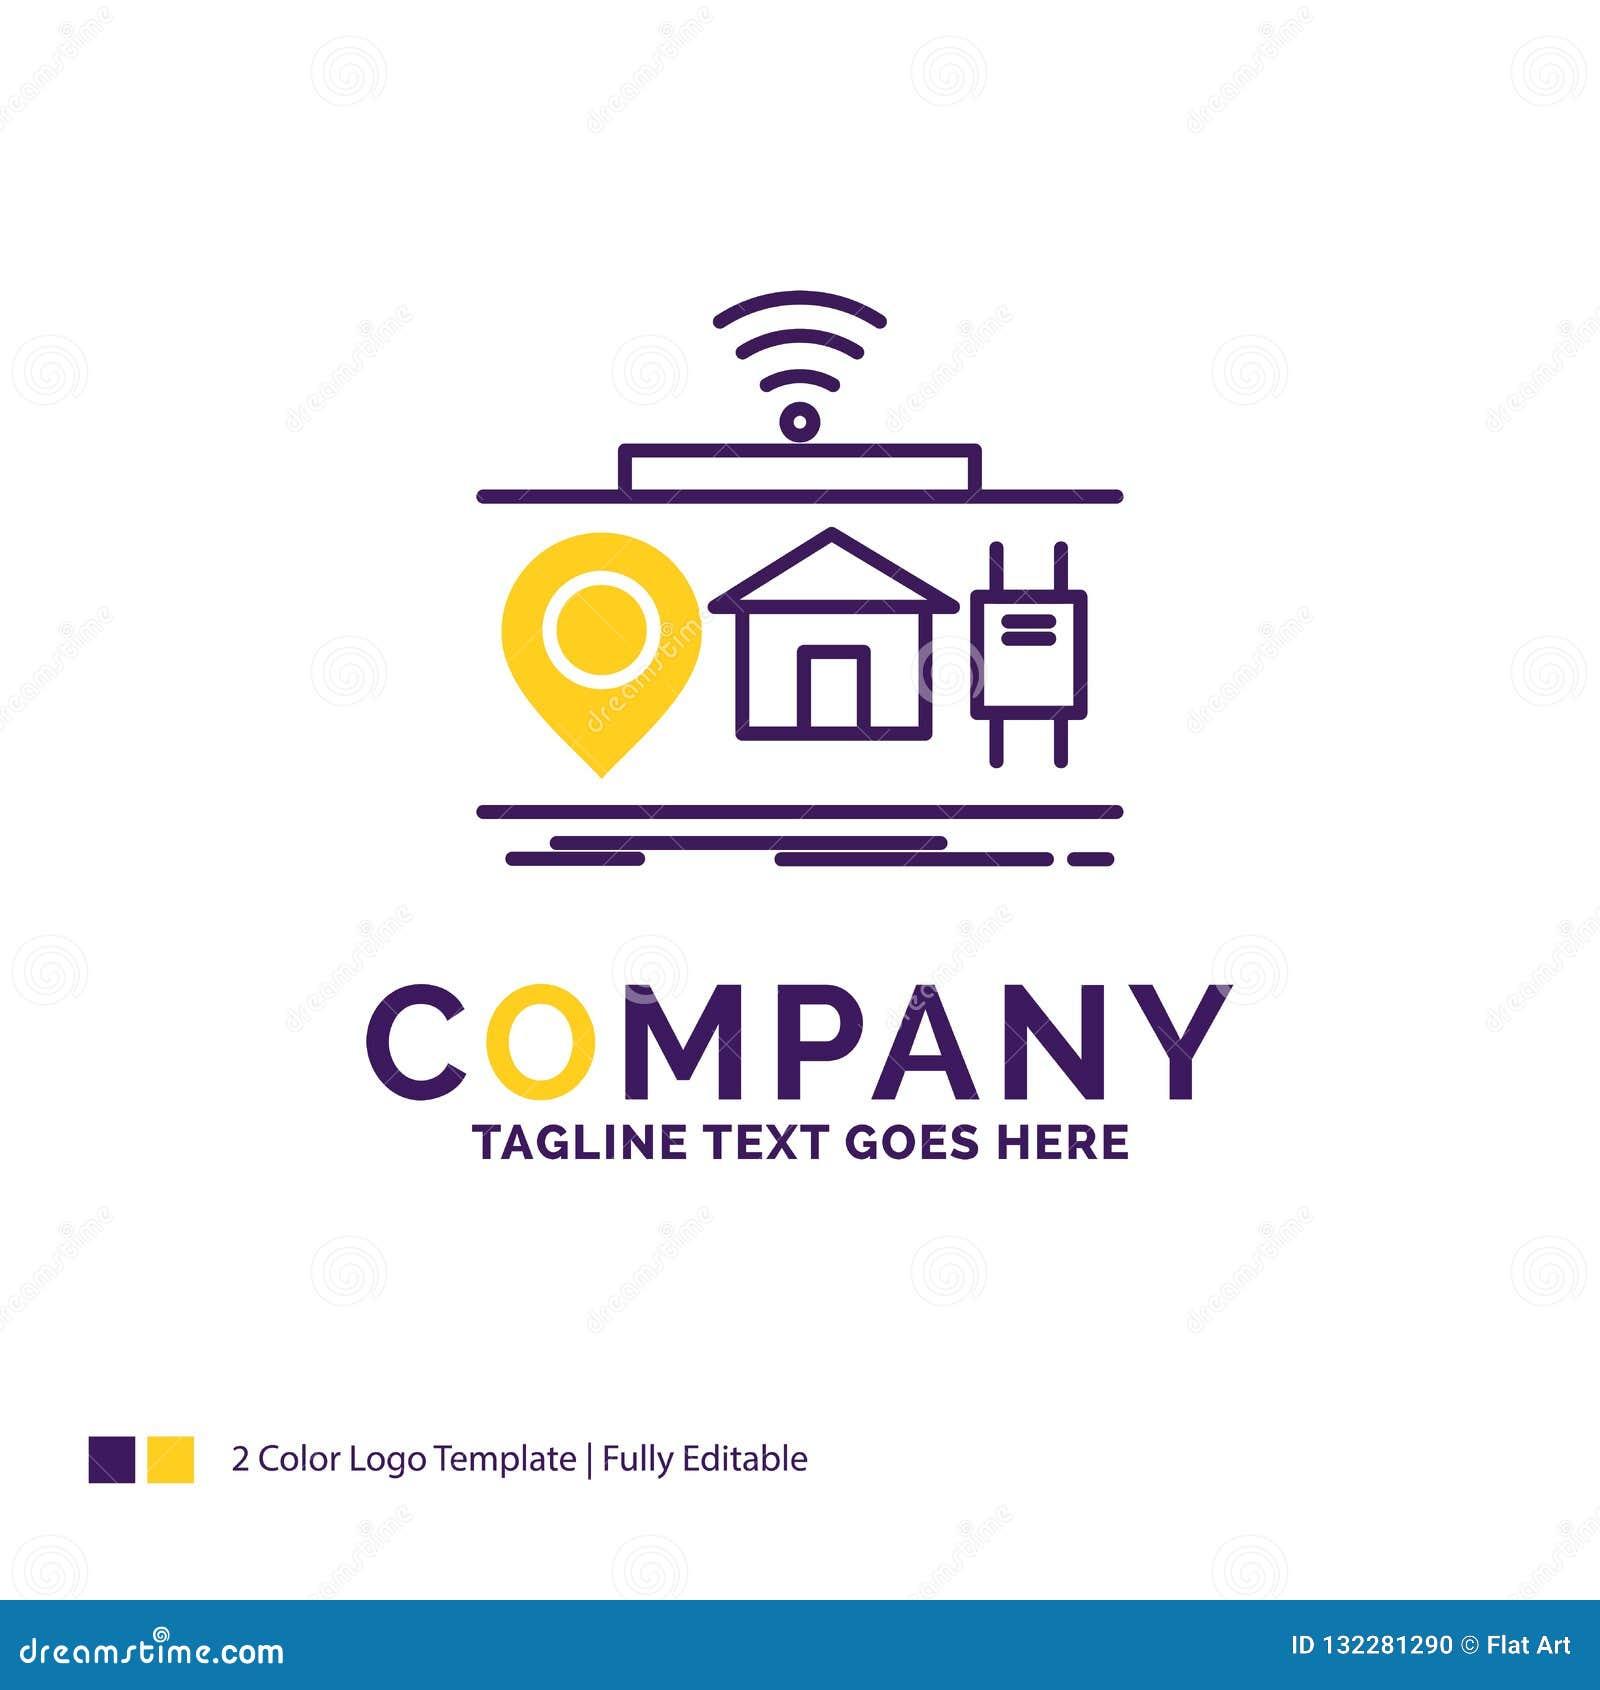 Company Name Logo Design For IOT, Gadgets, Internet, Of